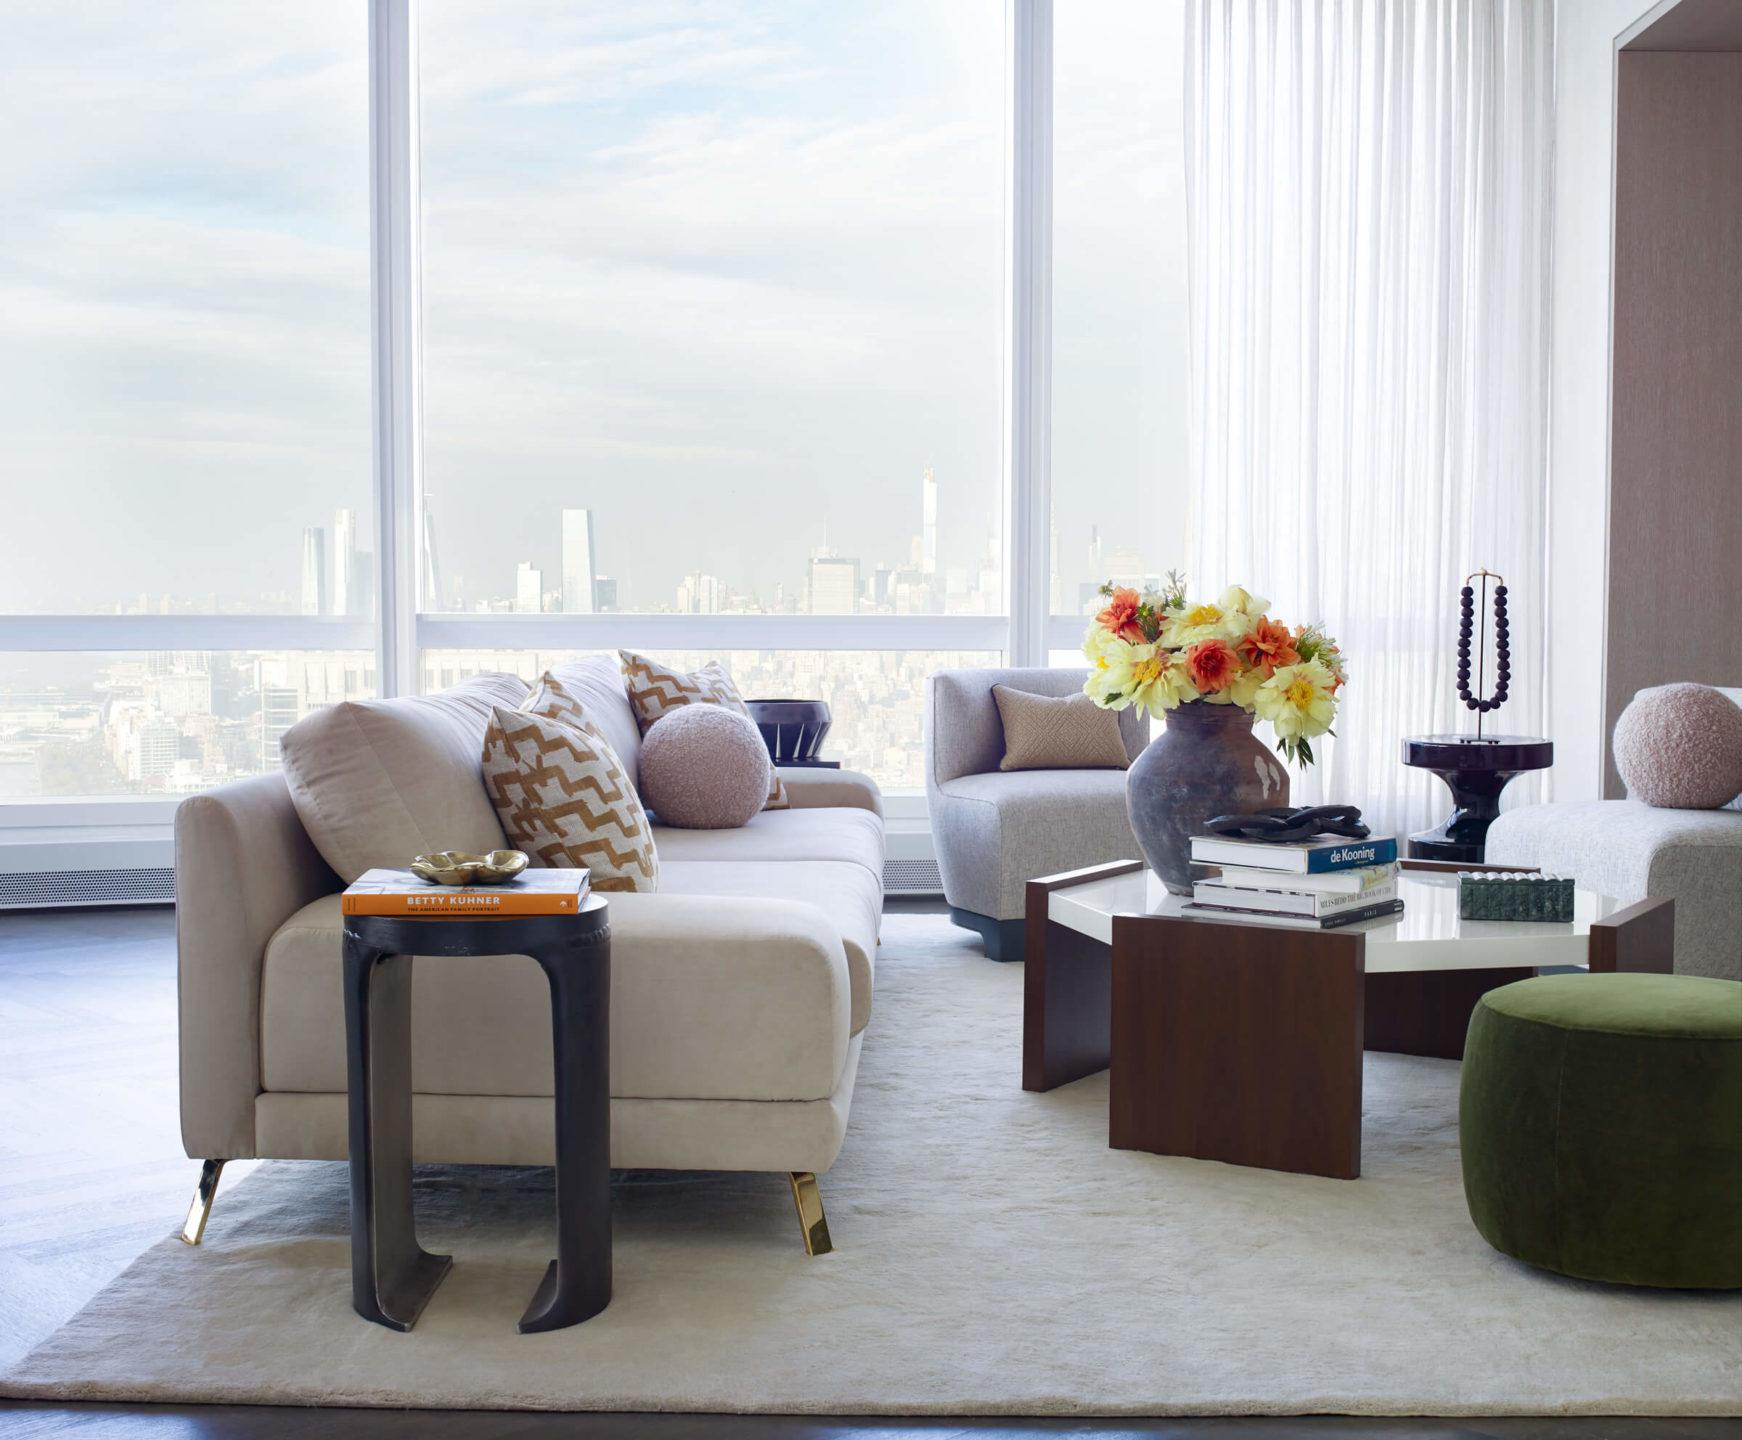 nicole-fuller-luxury-interior-designer-nyc-murry-project-S12_195